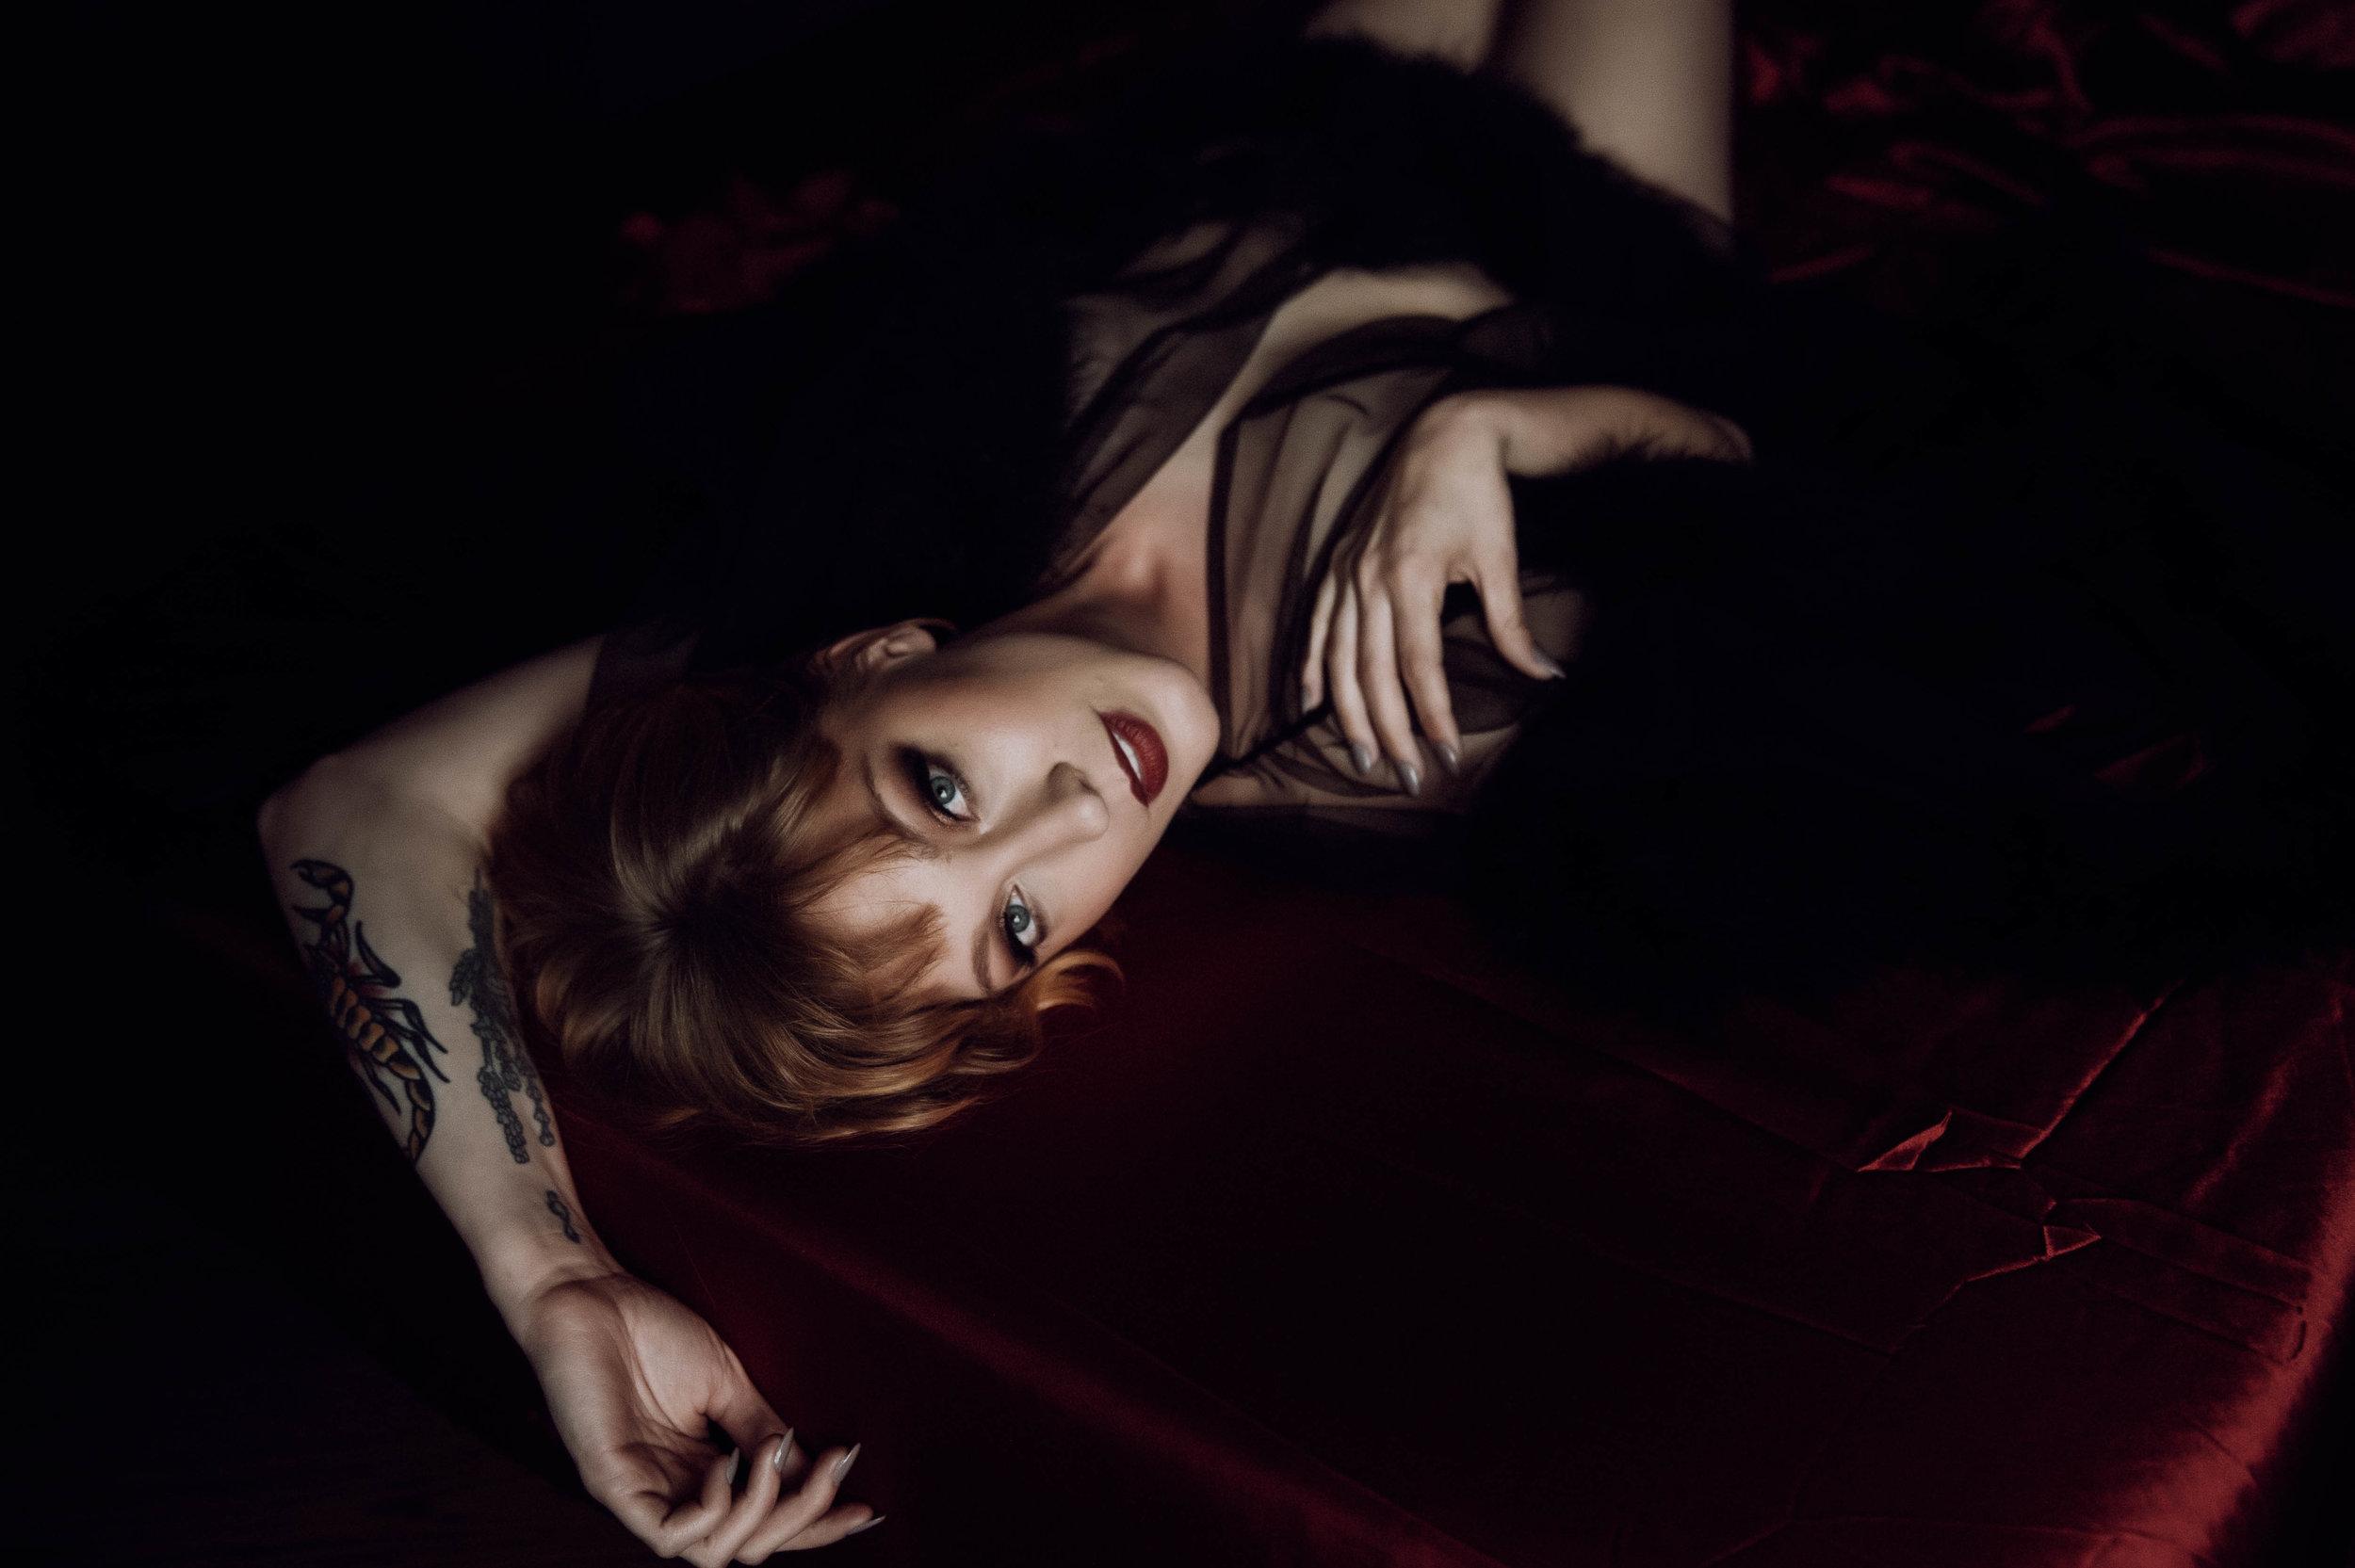 Redhead in black robe intimate boudoir photography new york city studio